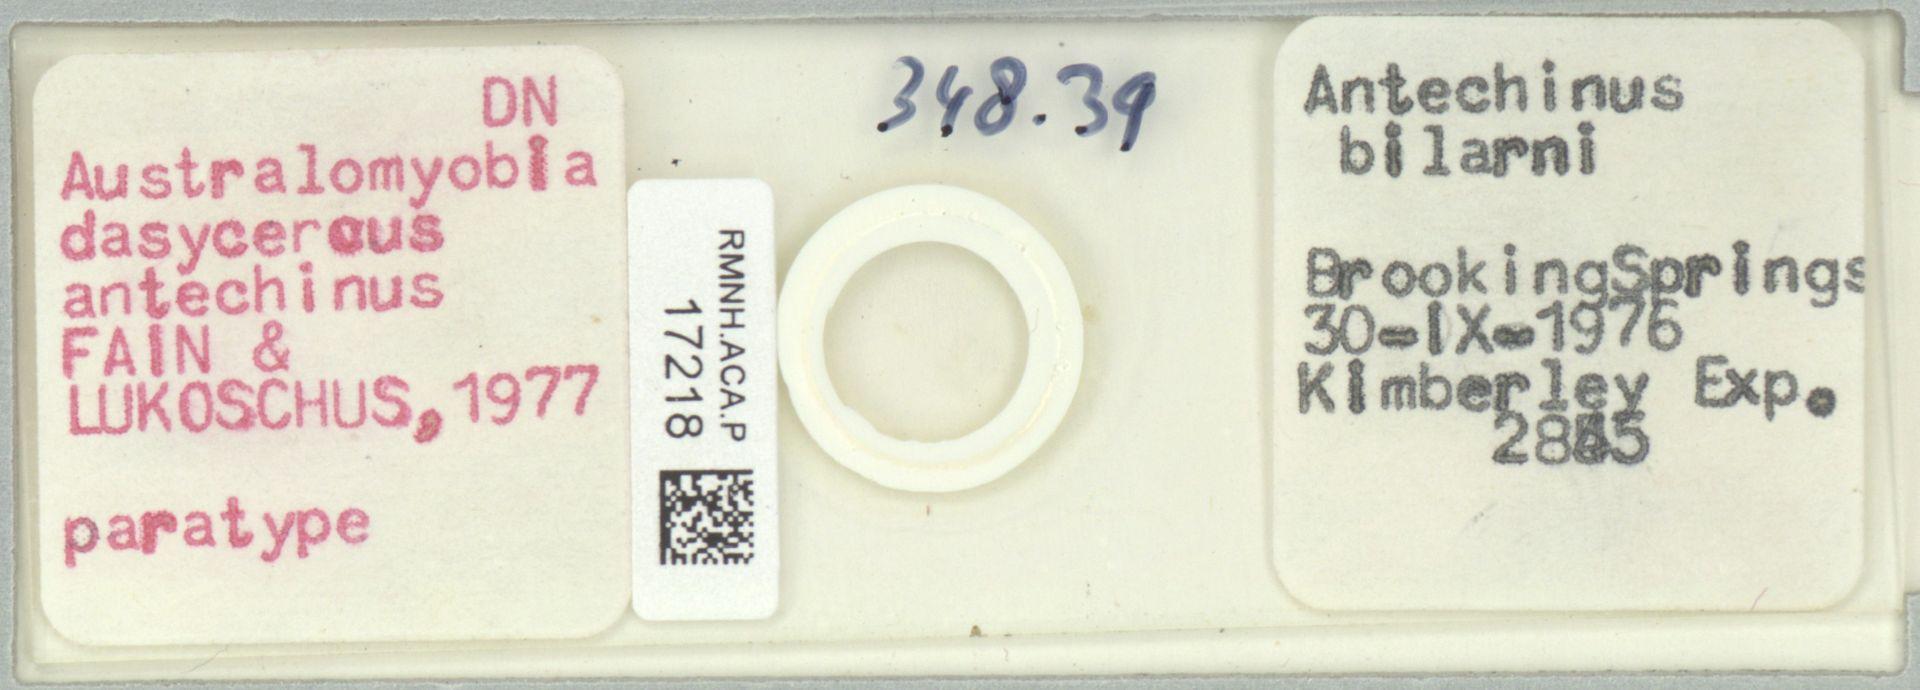 RMNH.ACA.P.17218 | Australomyobia dasycercus antechinus